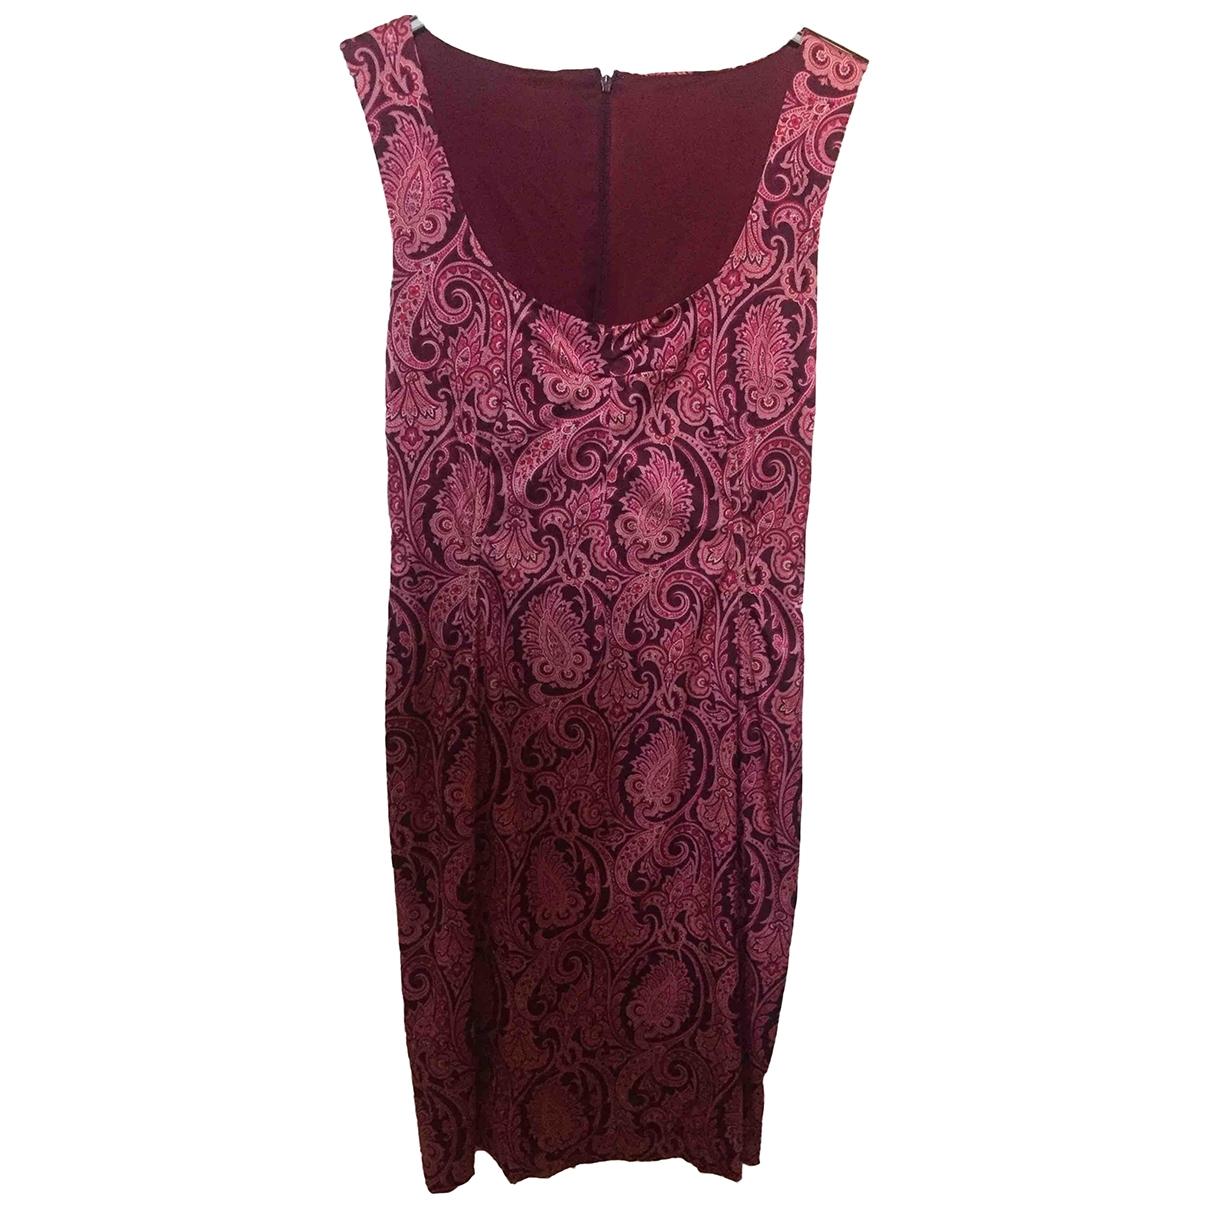 Dolce & Gabbana \N Burgundy Silk dress for Women 40 IT